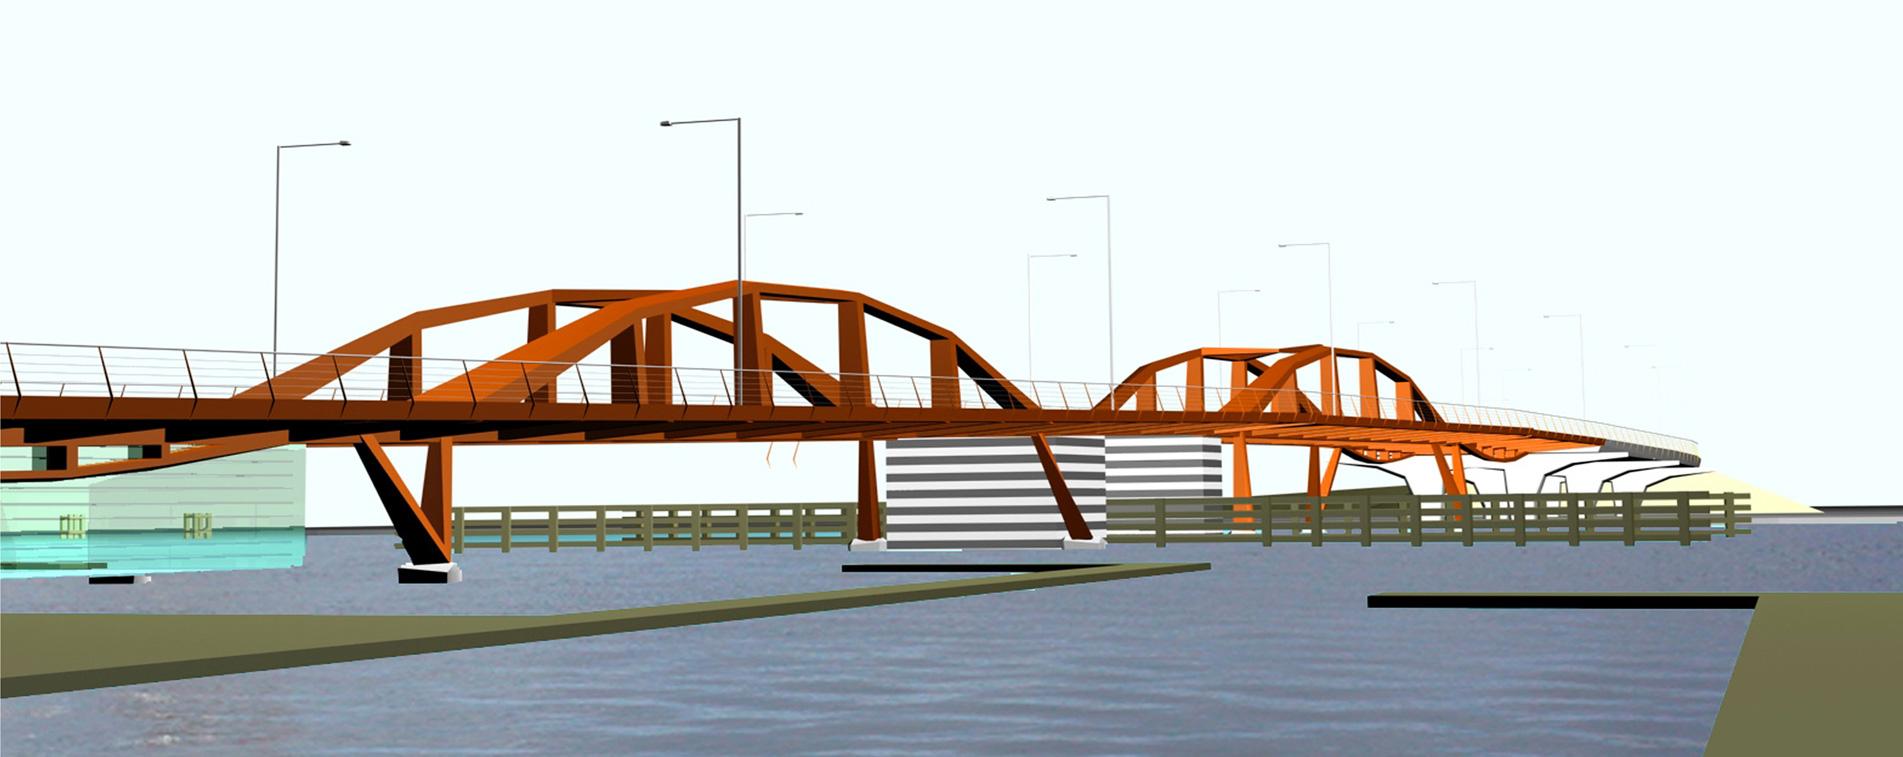 Schoteroogbrug - Haarlem (3)